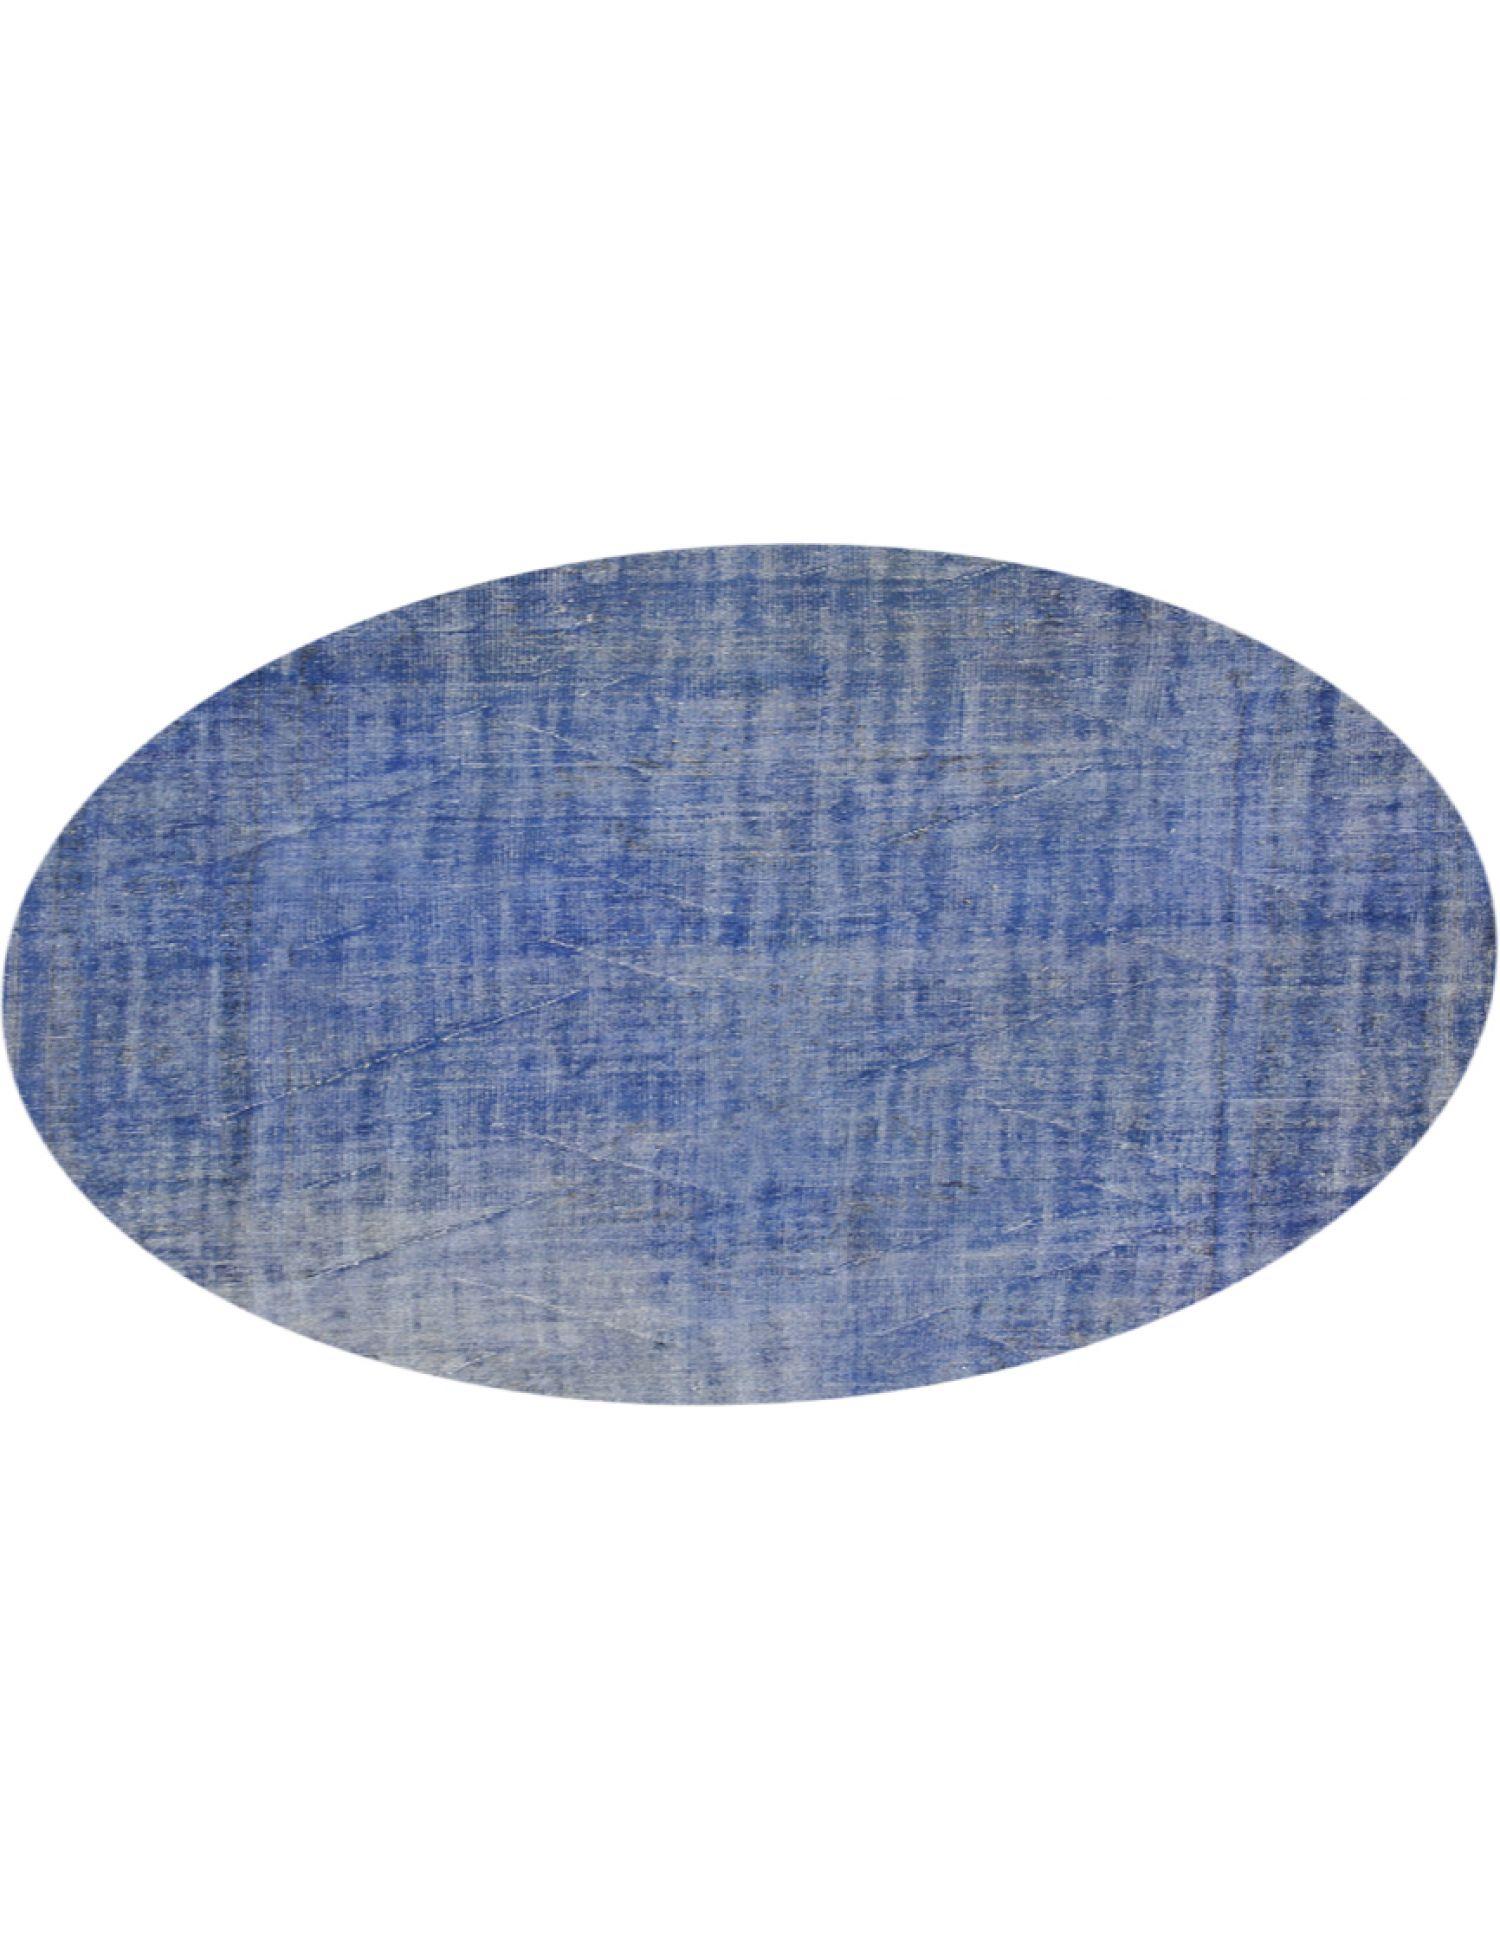 Tappeto Vintage  blu <br/>222 x 222 cm